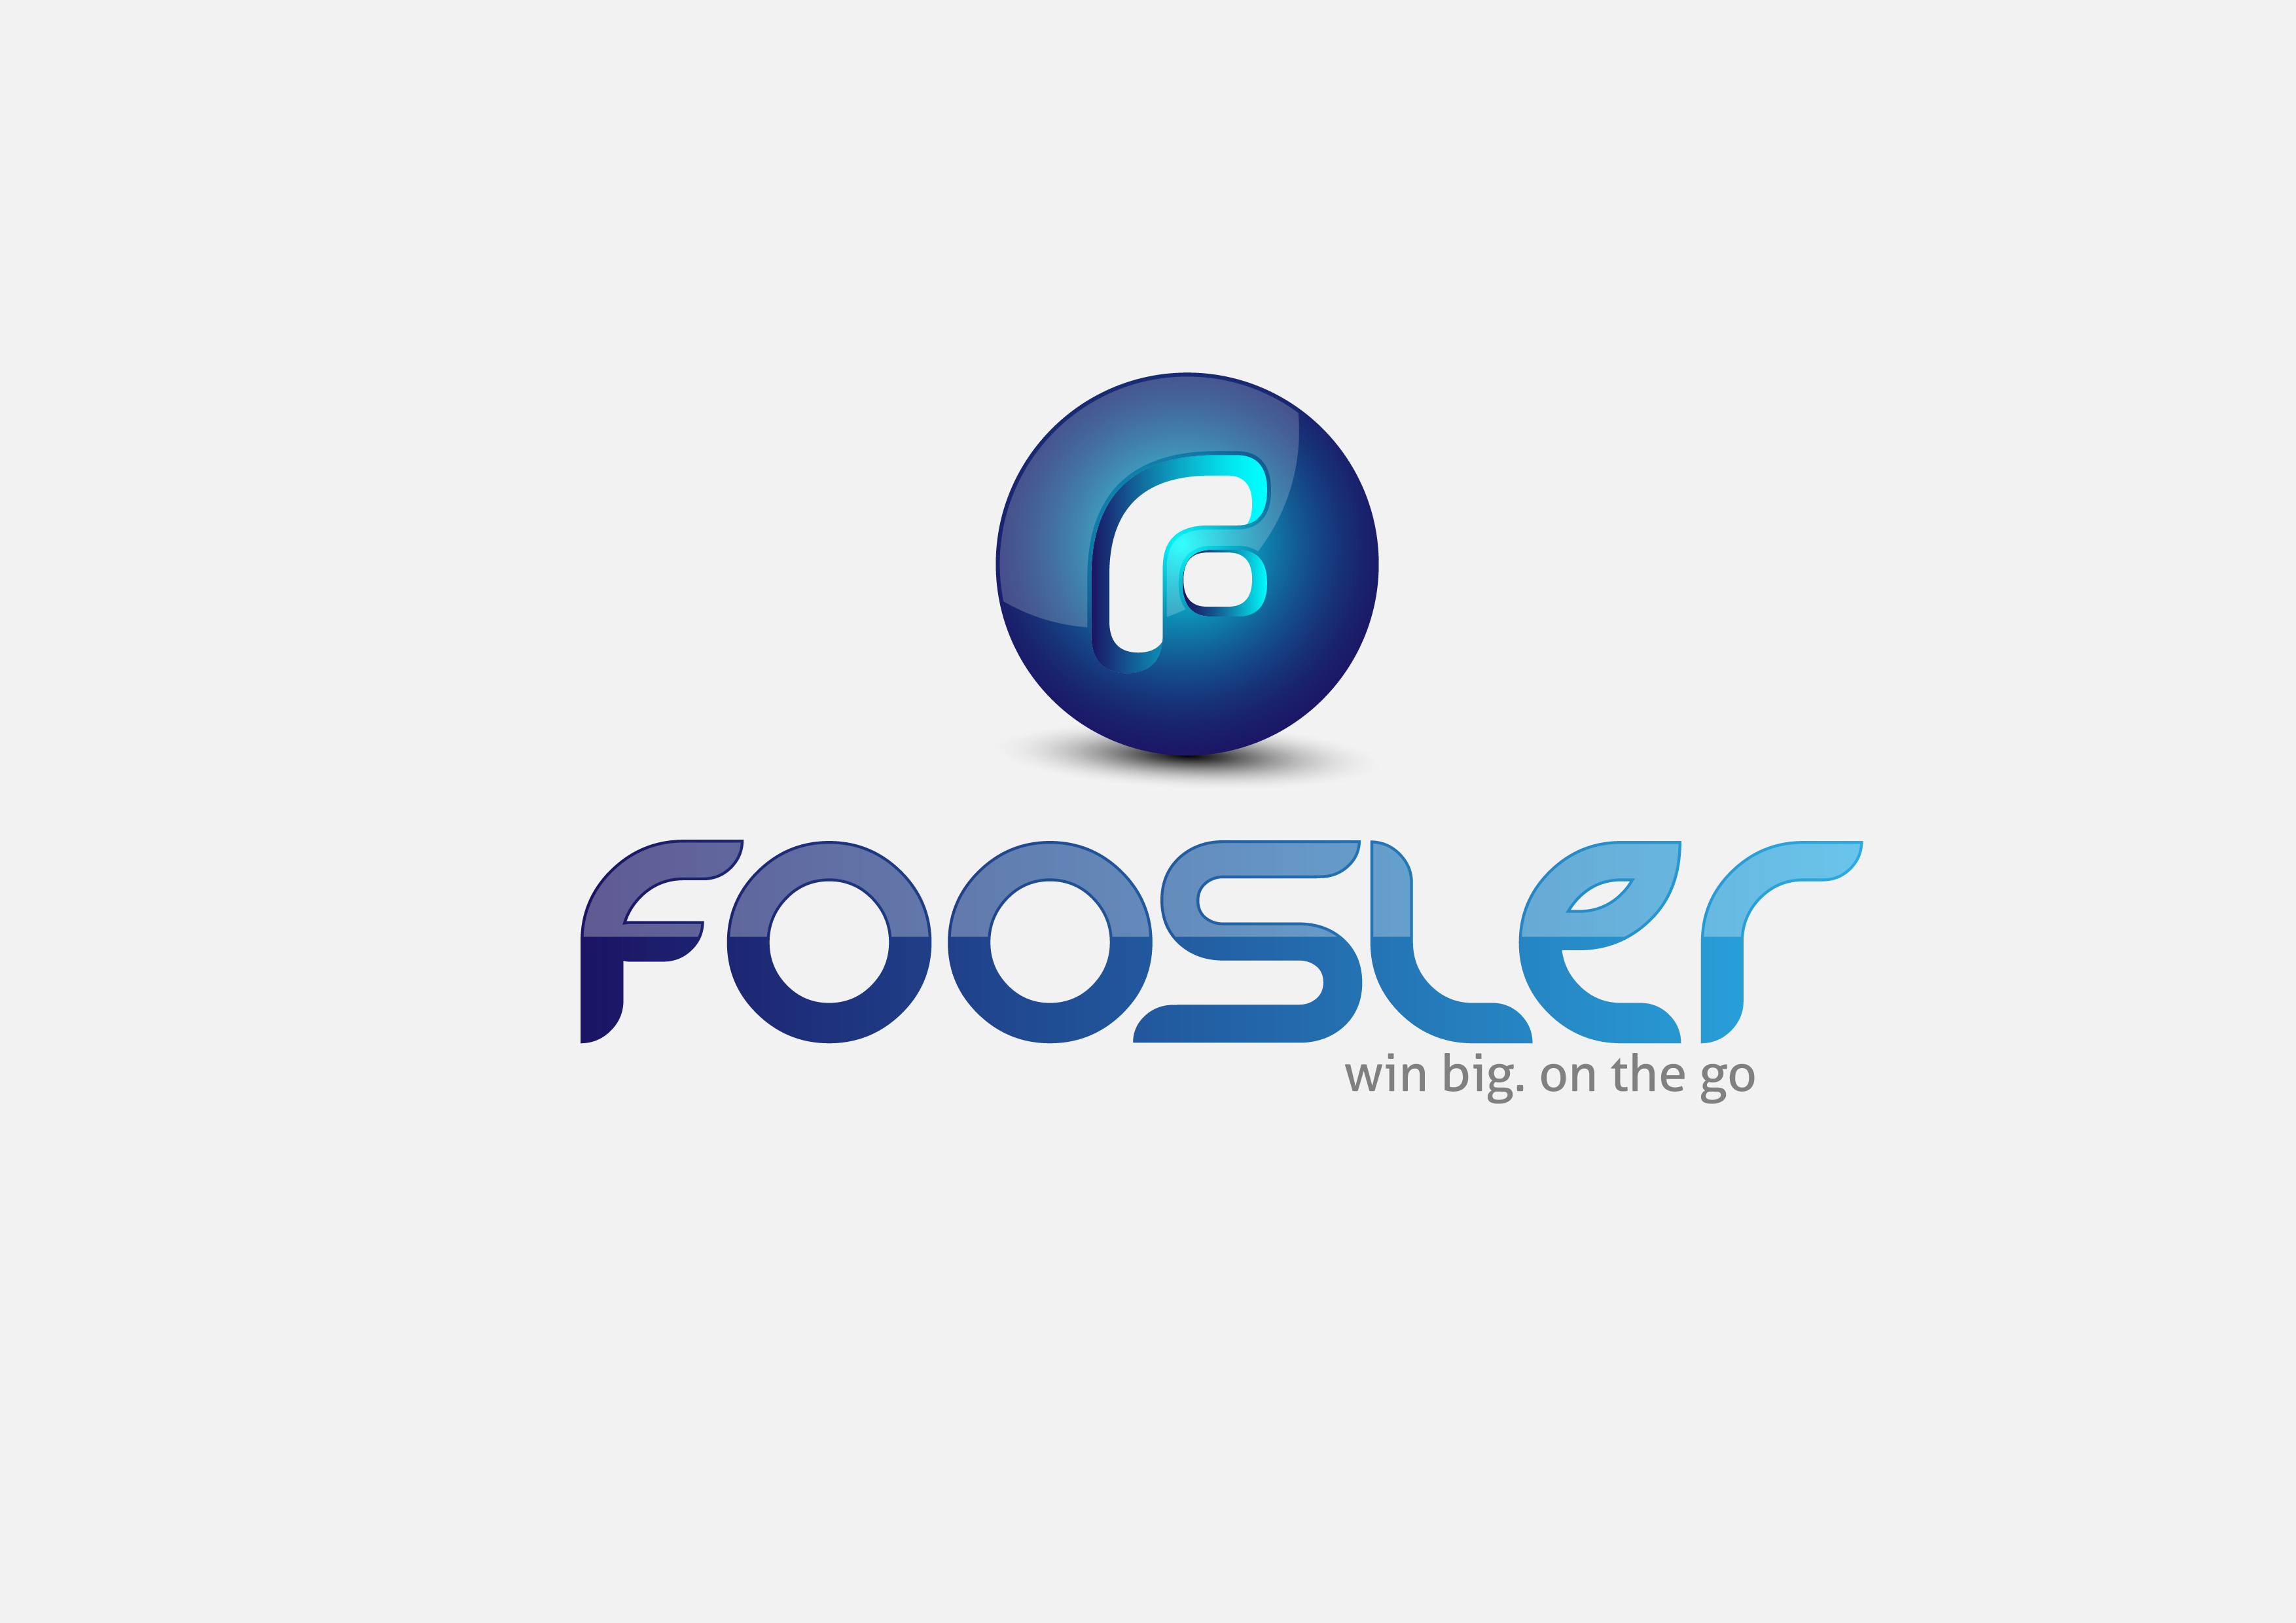 Logo Design by 3draw - Entry No. 118 in the Logo Design Contest Foosler Logo Design.